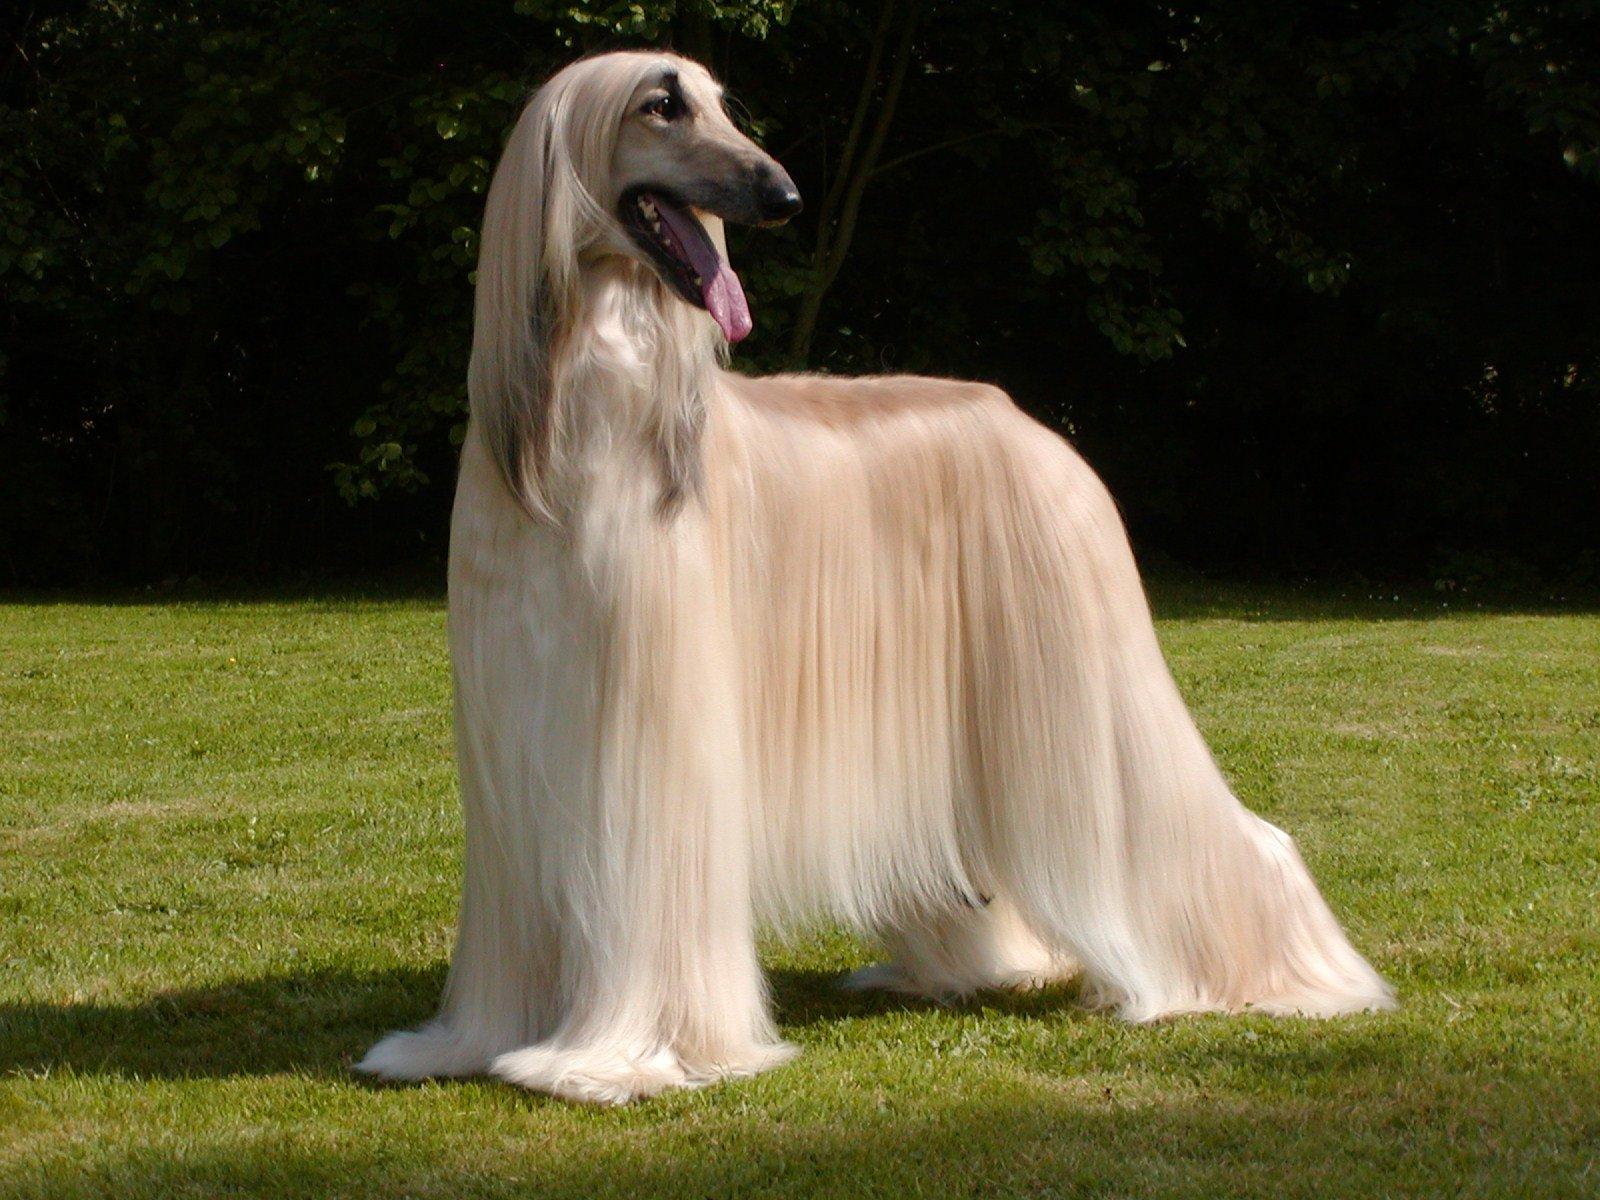 Sinhala Hound Dog: Sinhala Sinhala Hound Breed